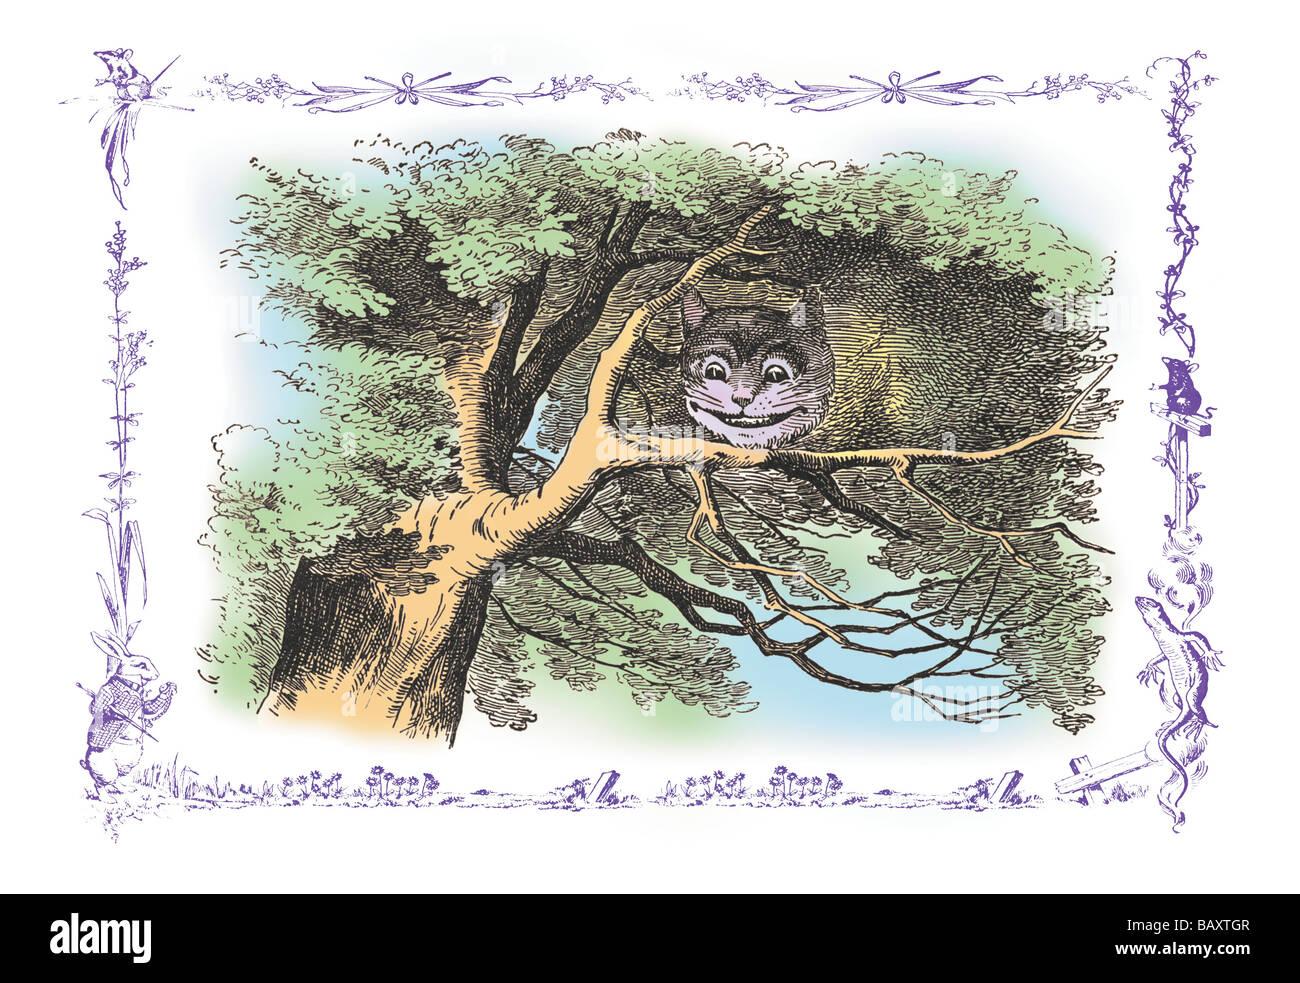 Alice in Wonderland: The Cheshire Cat - Stock Image